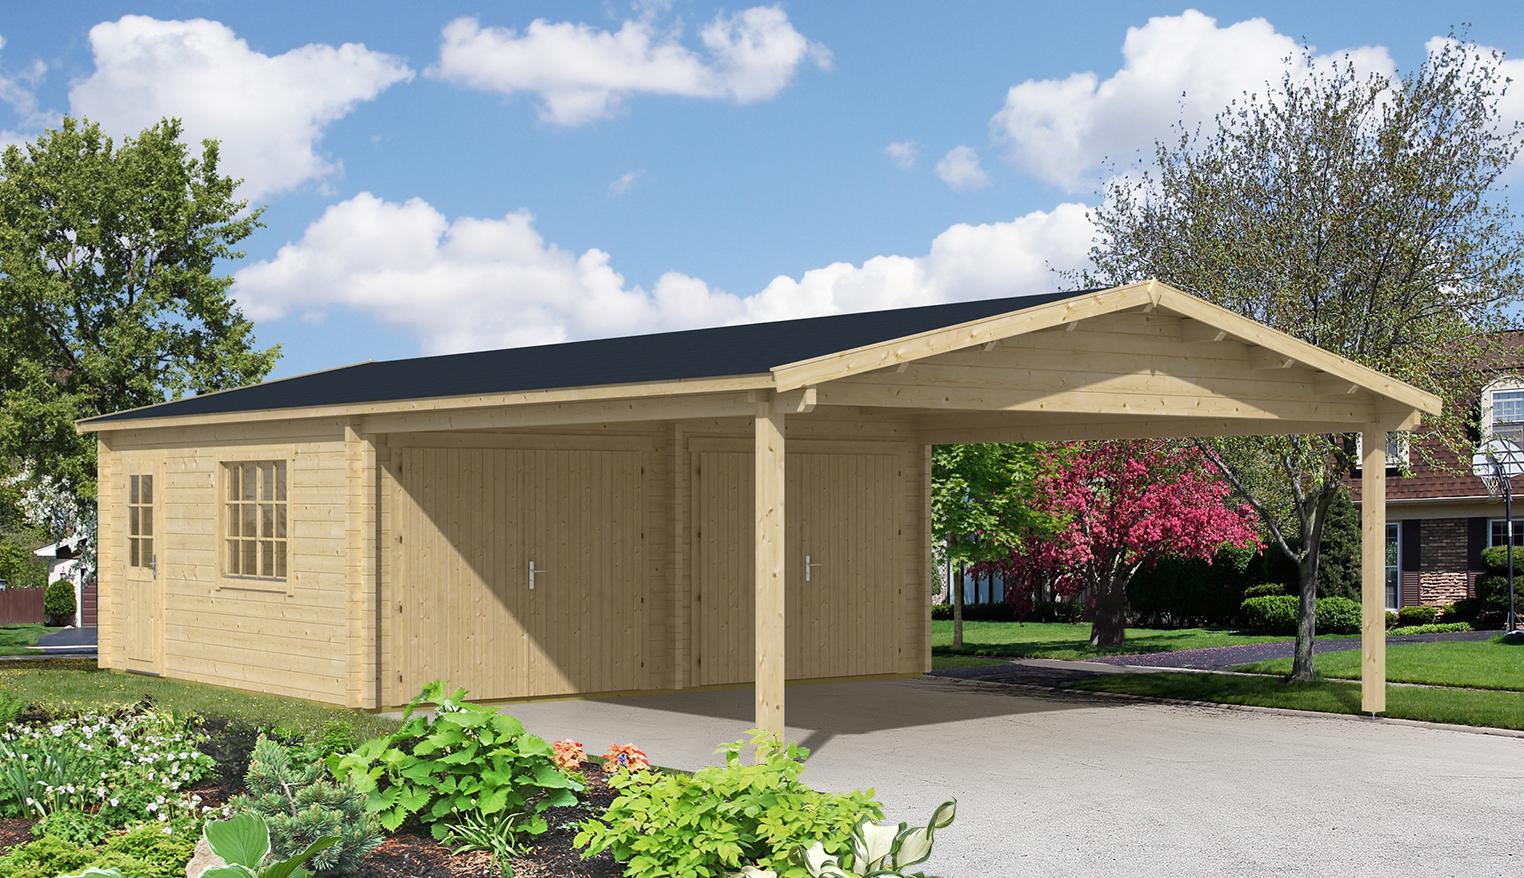 doppelgarage mit carport modell falun 44 iso. Black Bedroom Furniture Sets. Home Design Ideas